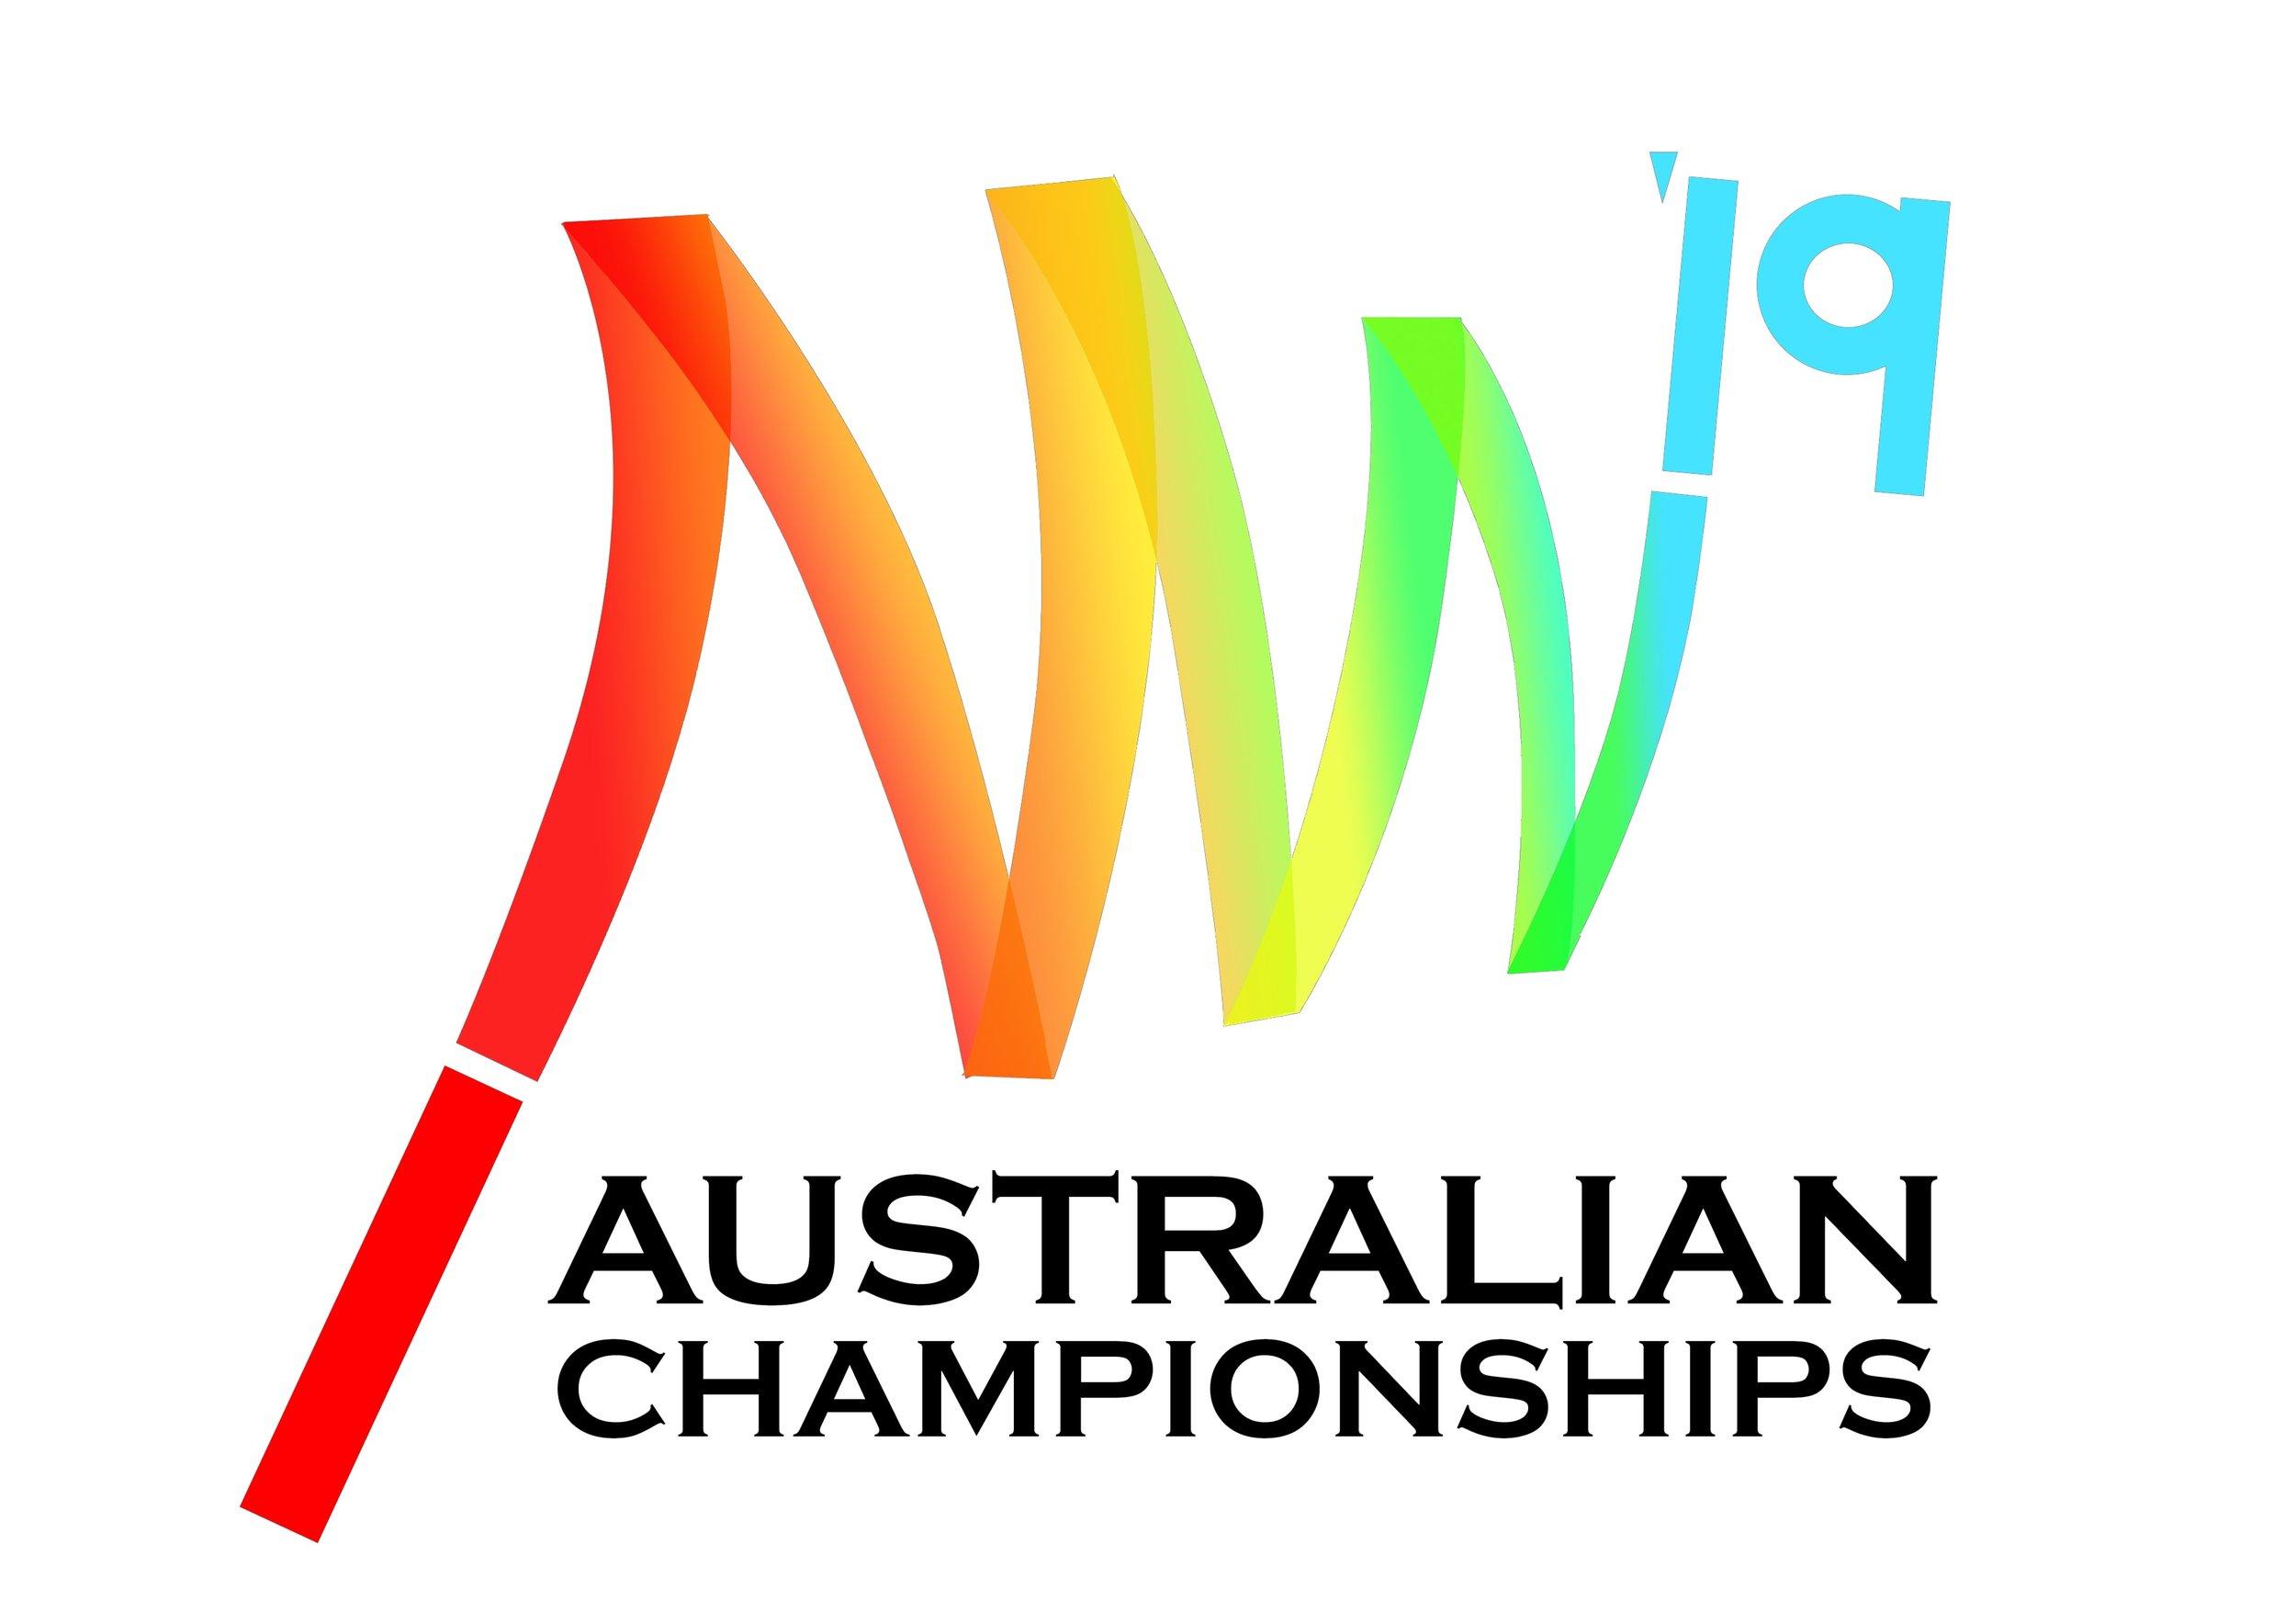 2019 Aust Champs logo copy.jpg